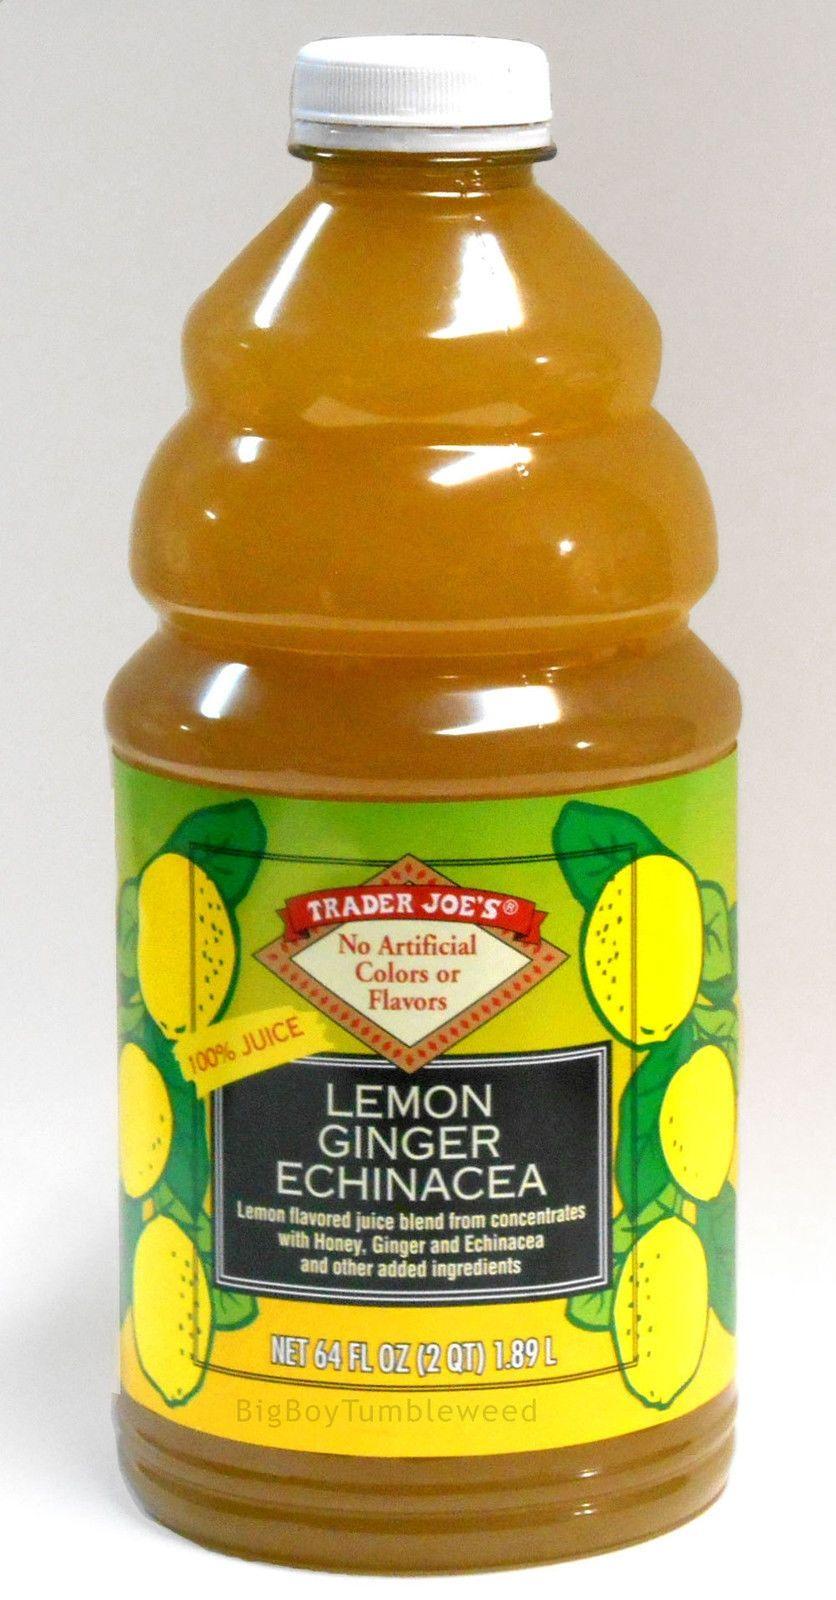 TraderJoes 100% Juice #Lemon #Ginger #Echinacea drink 64 oz fruit